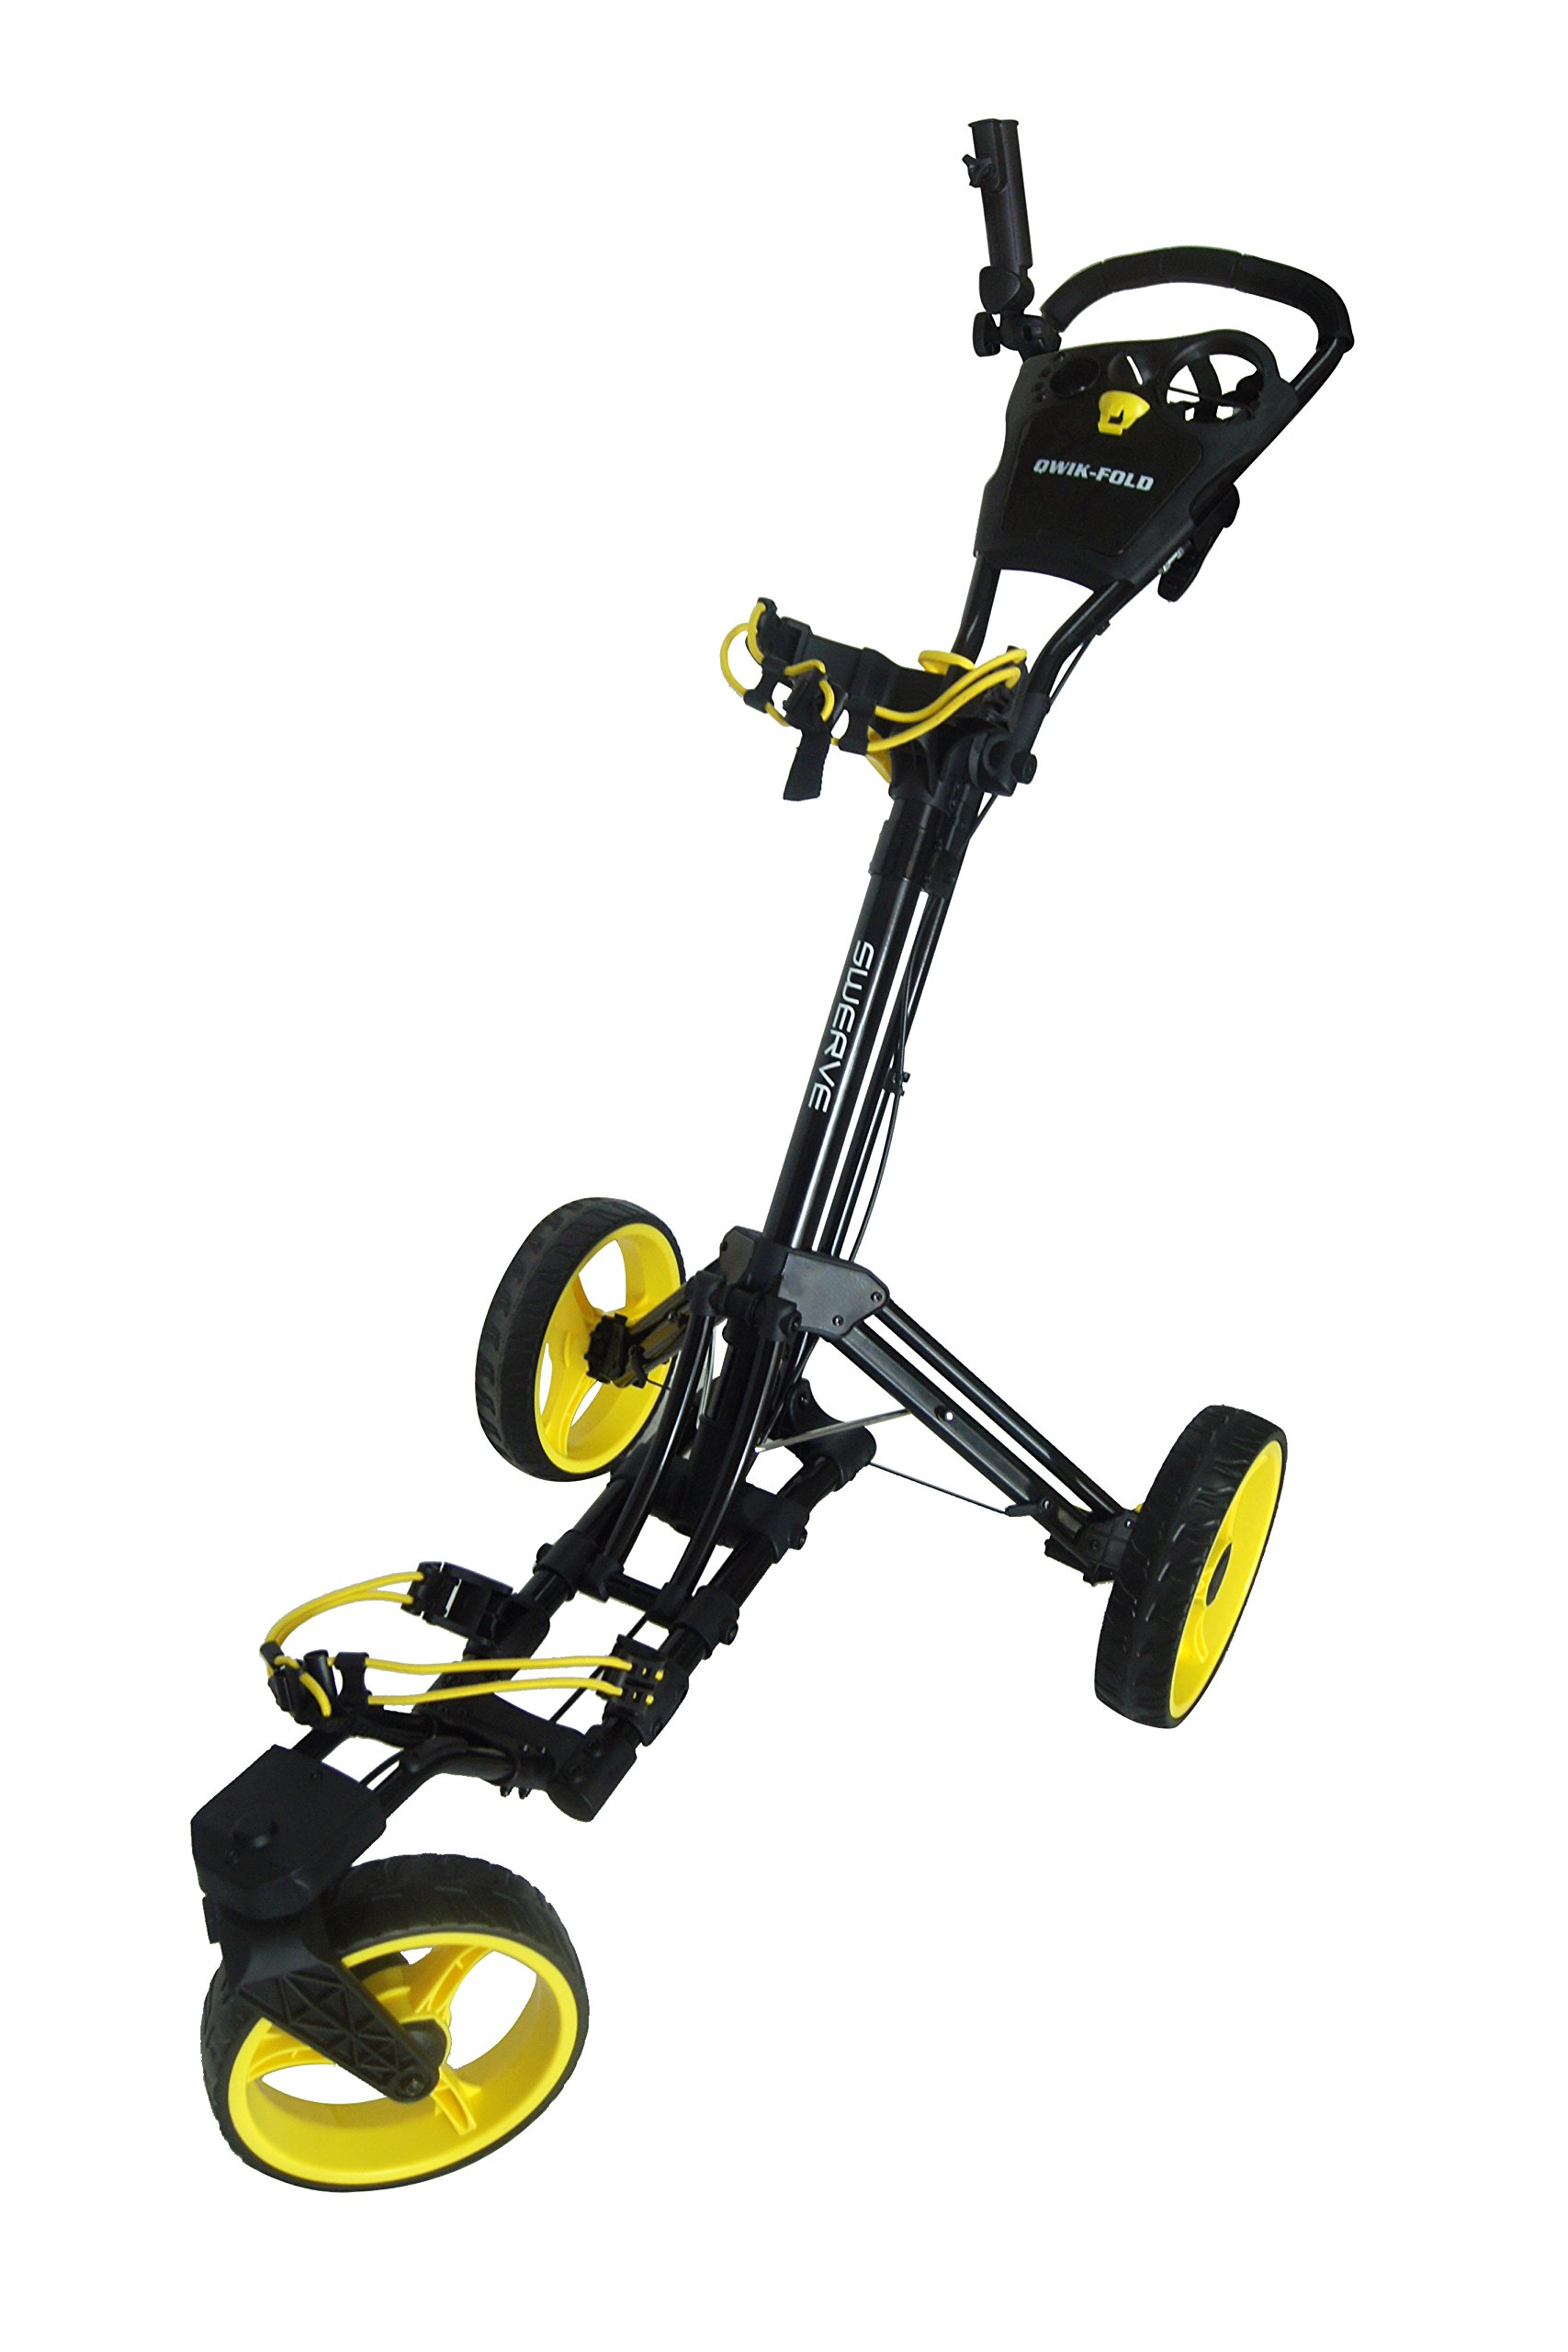 Swerve Founders Club 360 Swivel Wheel Qwik Fold Golf Push Cart (Black/Yellow)